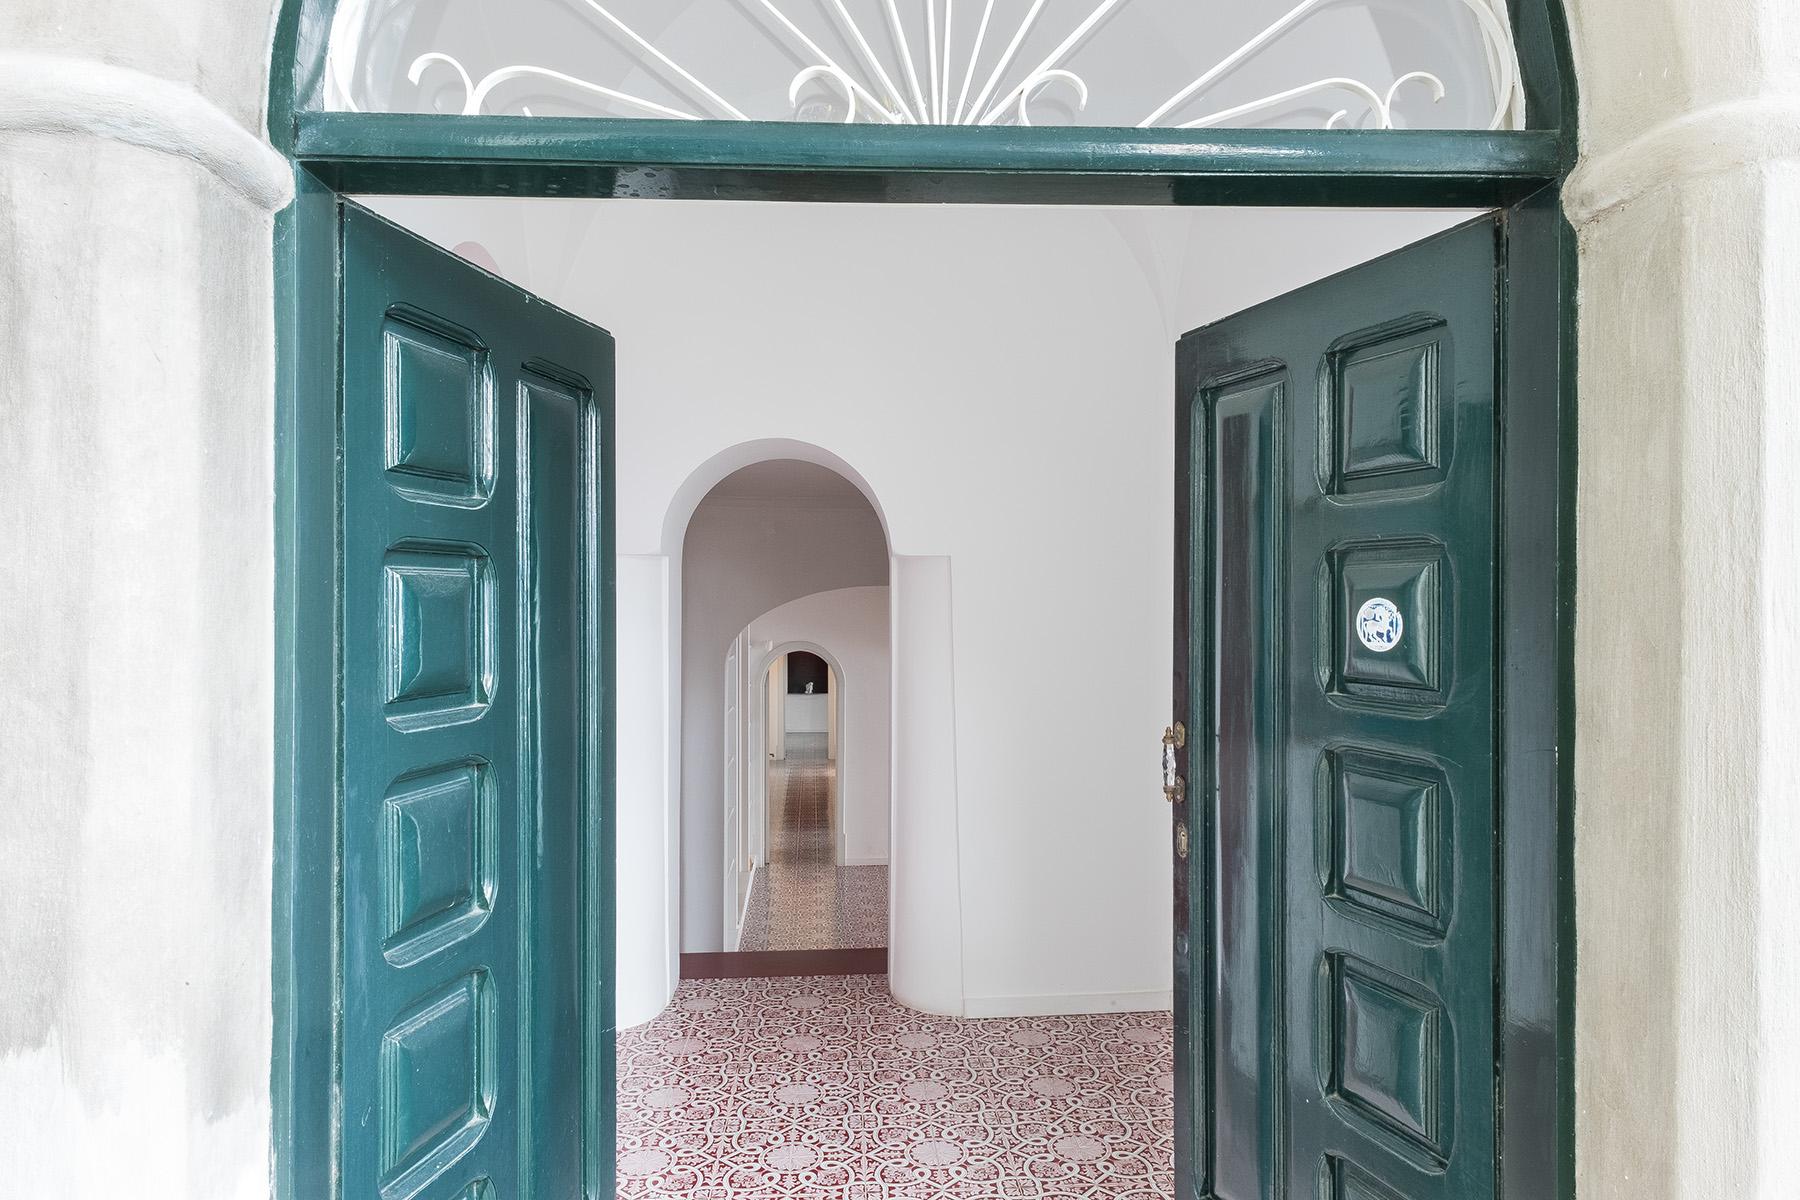 Casa indipendente in Vendita a Praiano: 4 locali, 250 mq - Foto 5